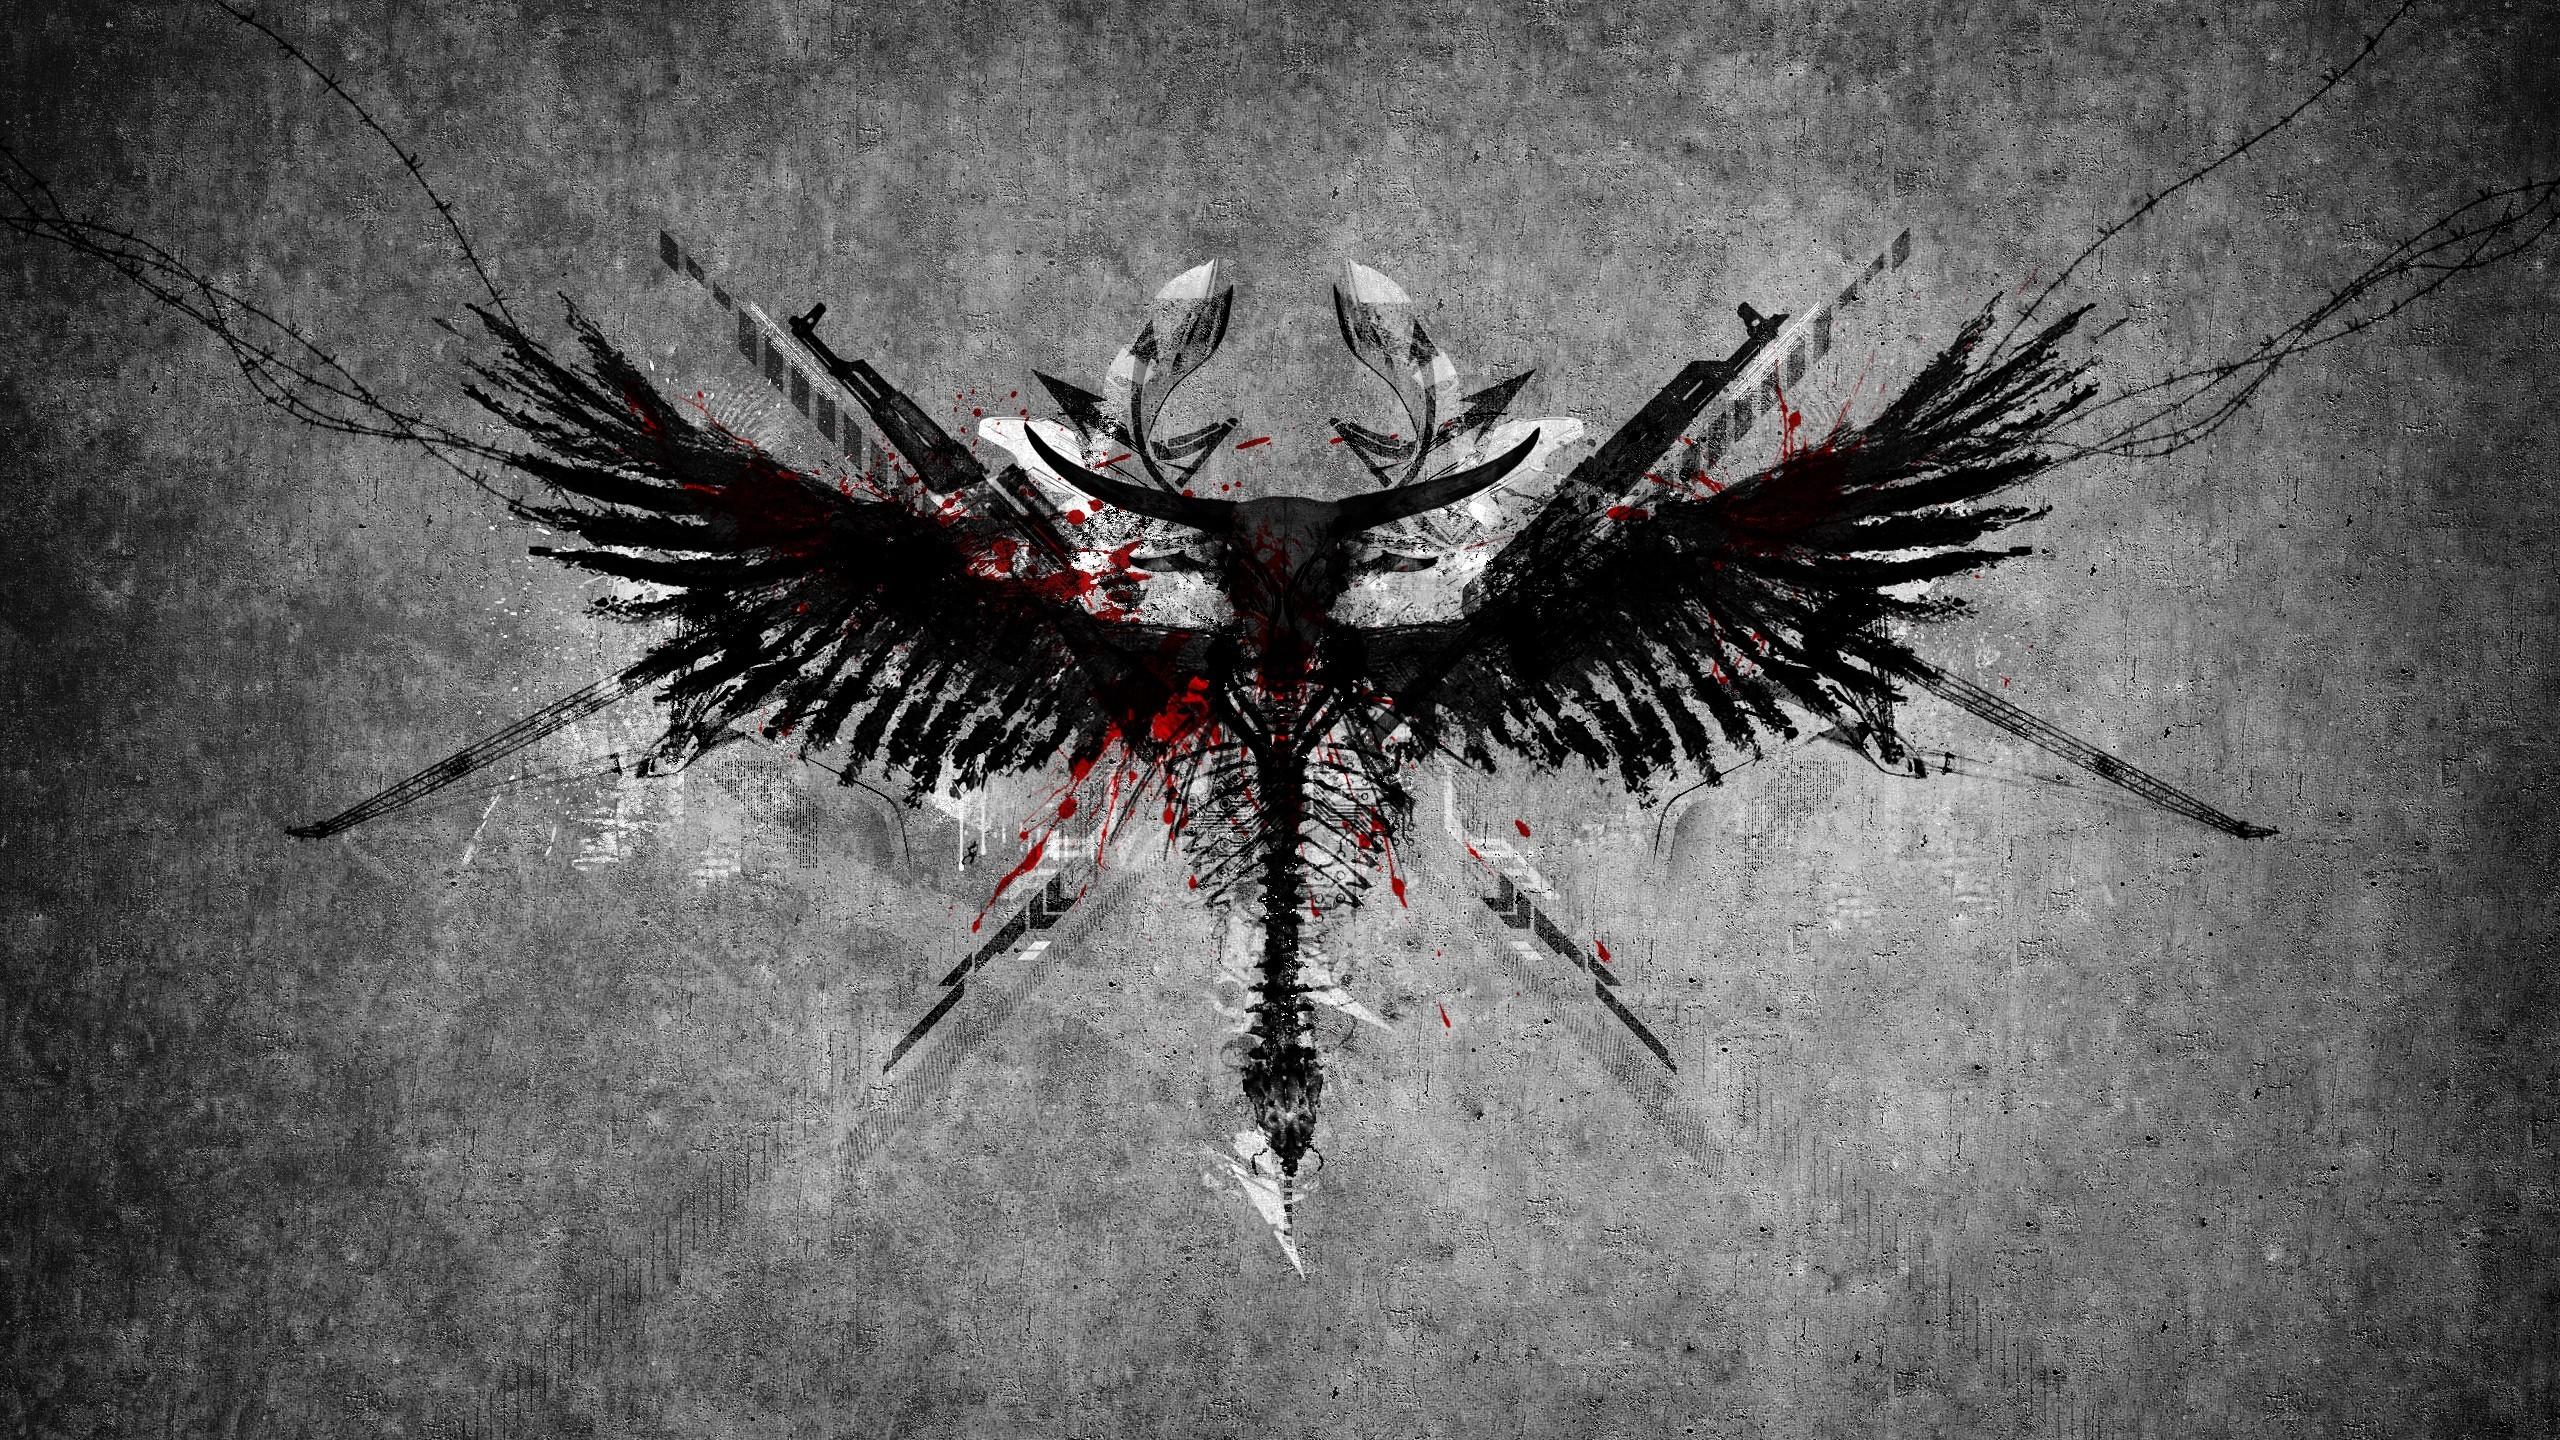 67 Angel Wings Wallpapers on WallpaperPlay 2560x1440